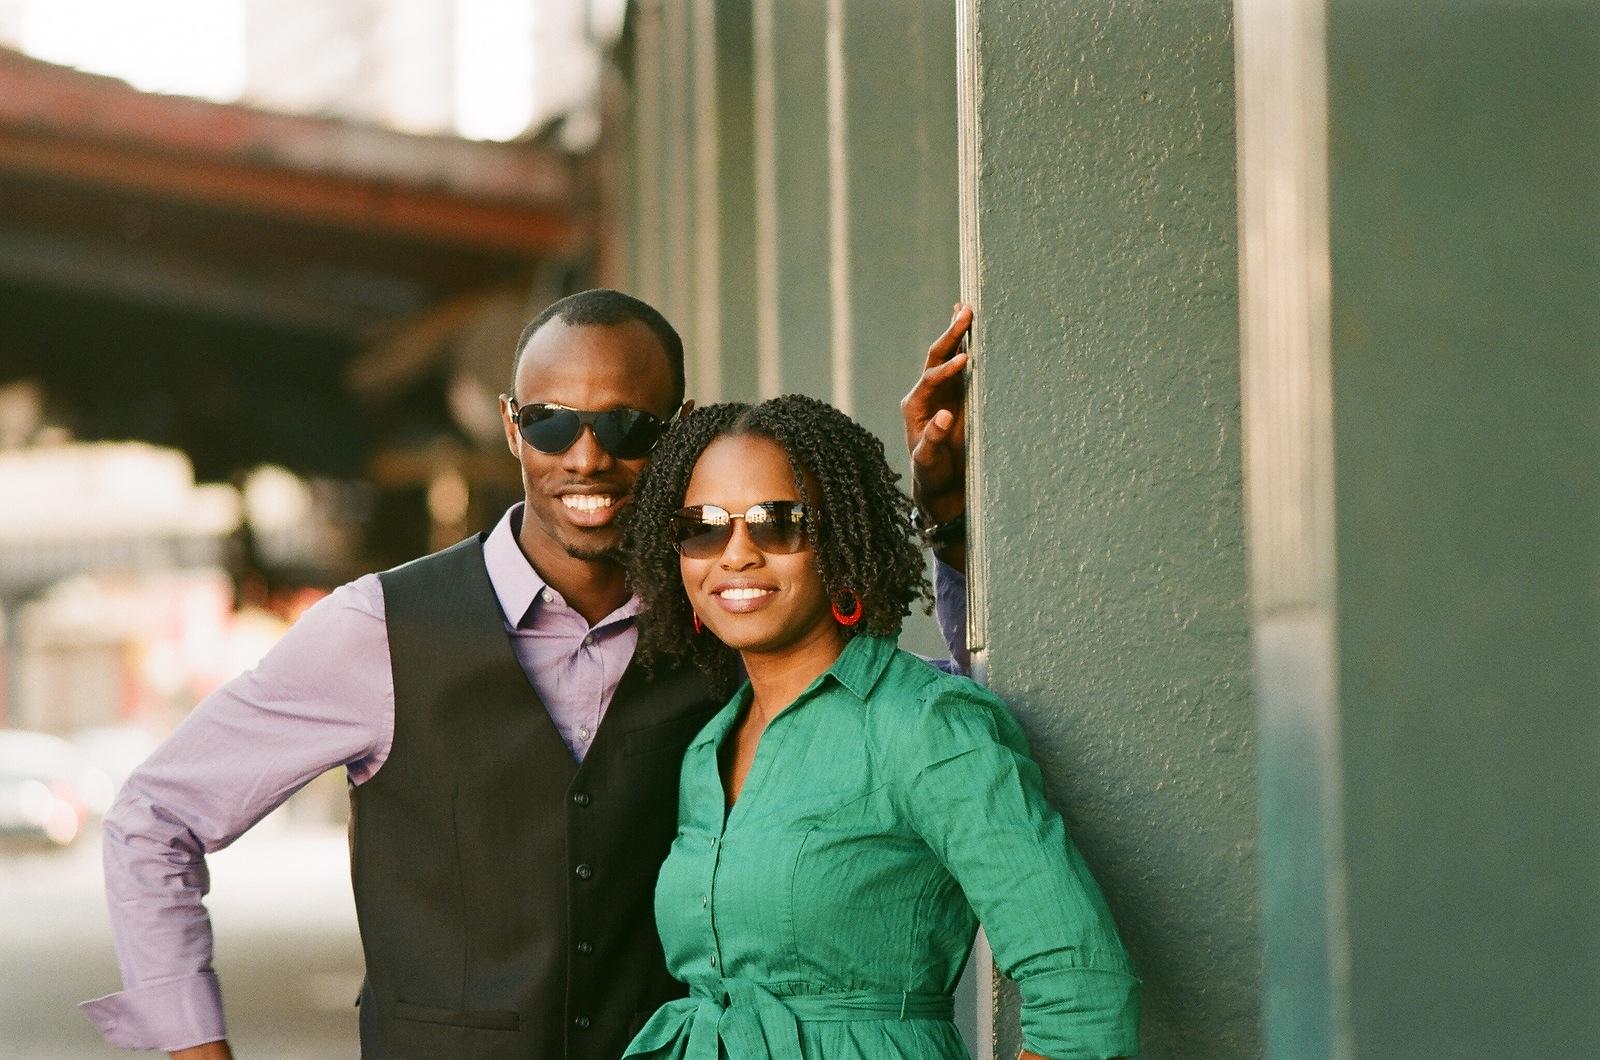 nyc engagement photo couple wearing sunglasses